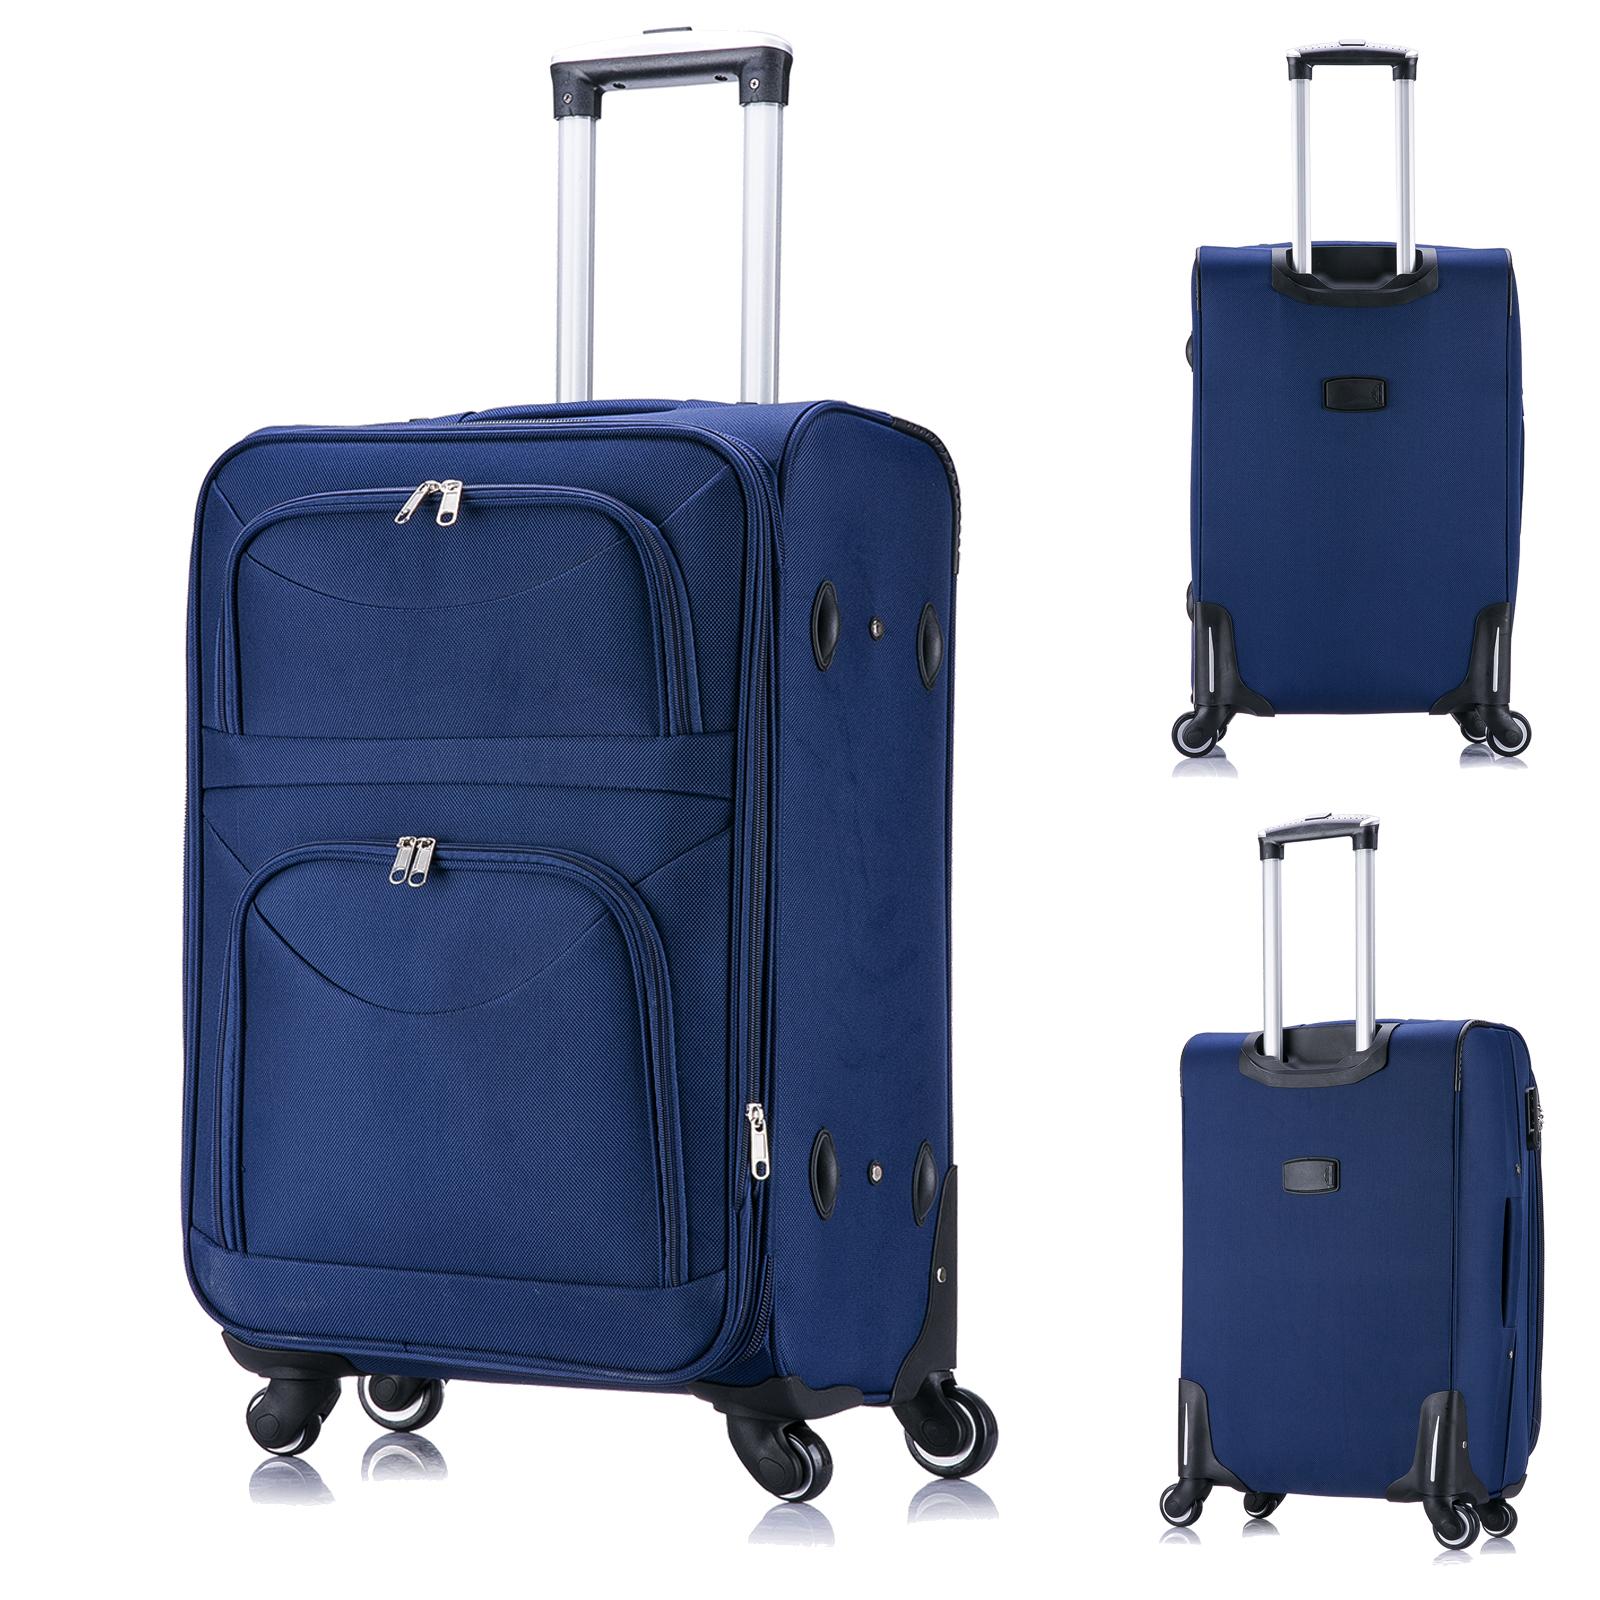 valise de voyage bagage en tissu avec 4 roues taille m xl. Black Bedroom Furniture Sets. Home Design Ideas